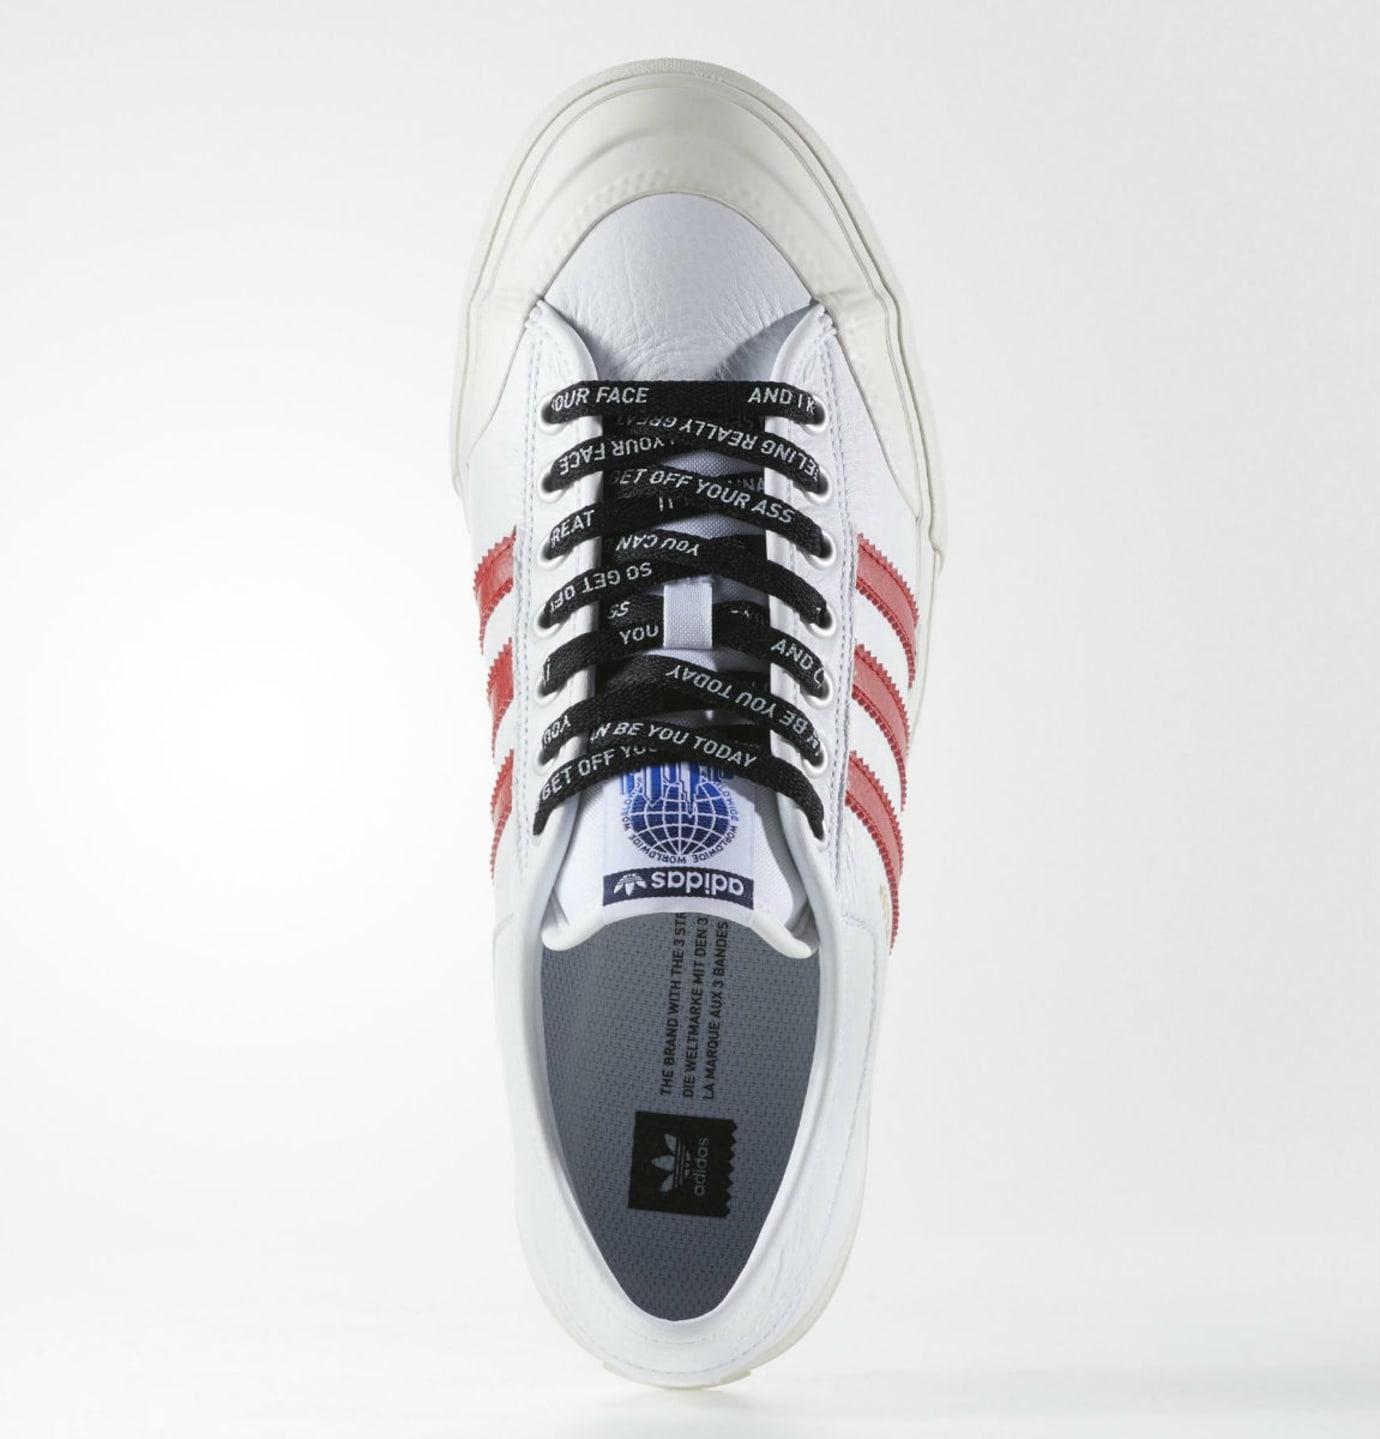 e6df59f5fbd3 ASAP Ferg Adidas Matchcourt Trap Lord Release Date Top CG5615